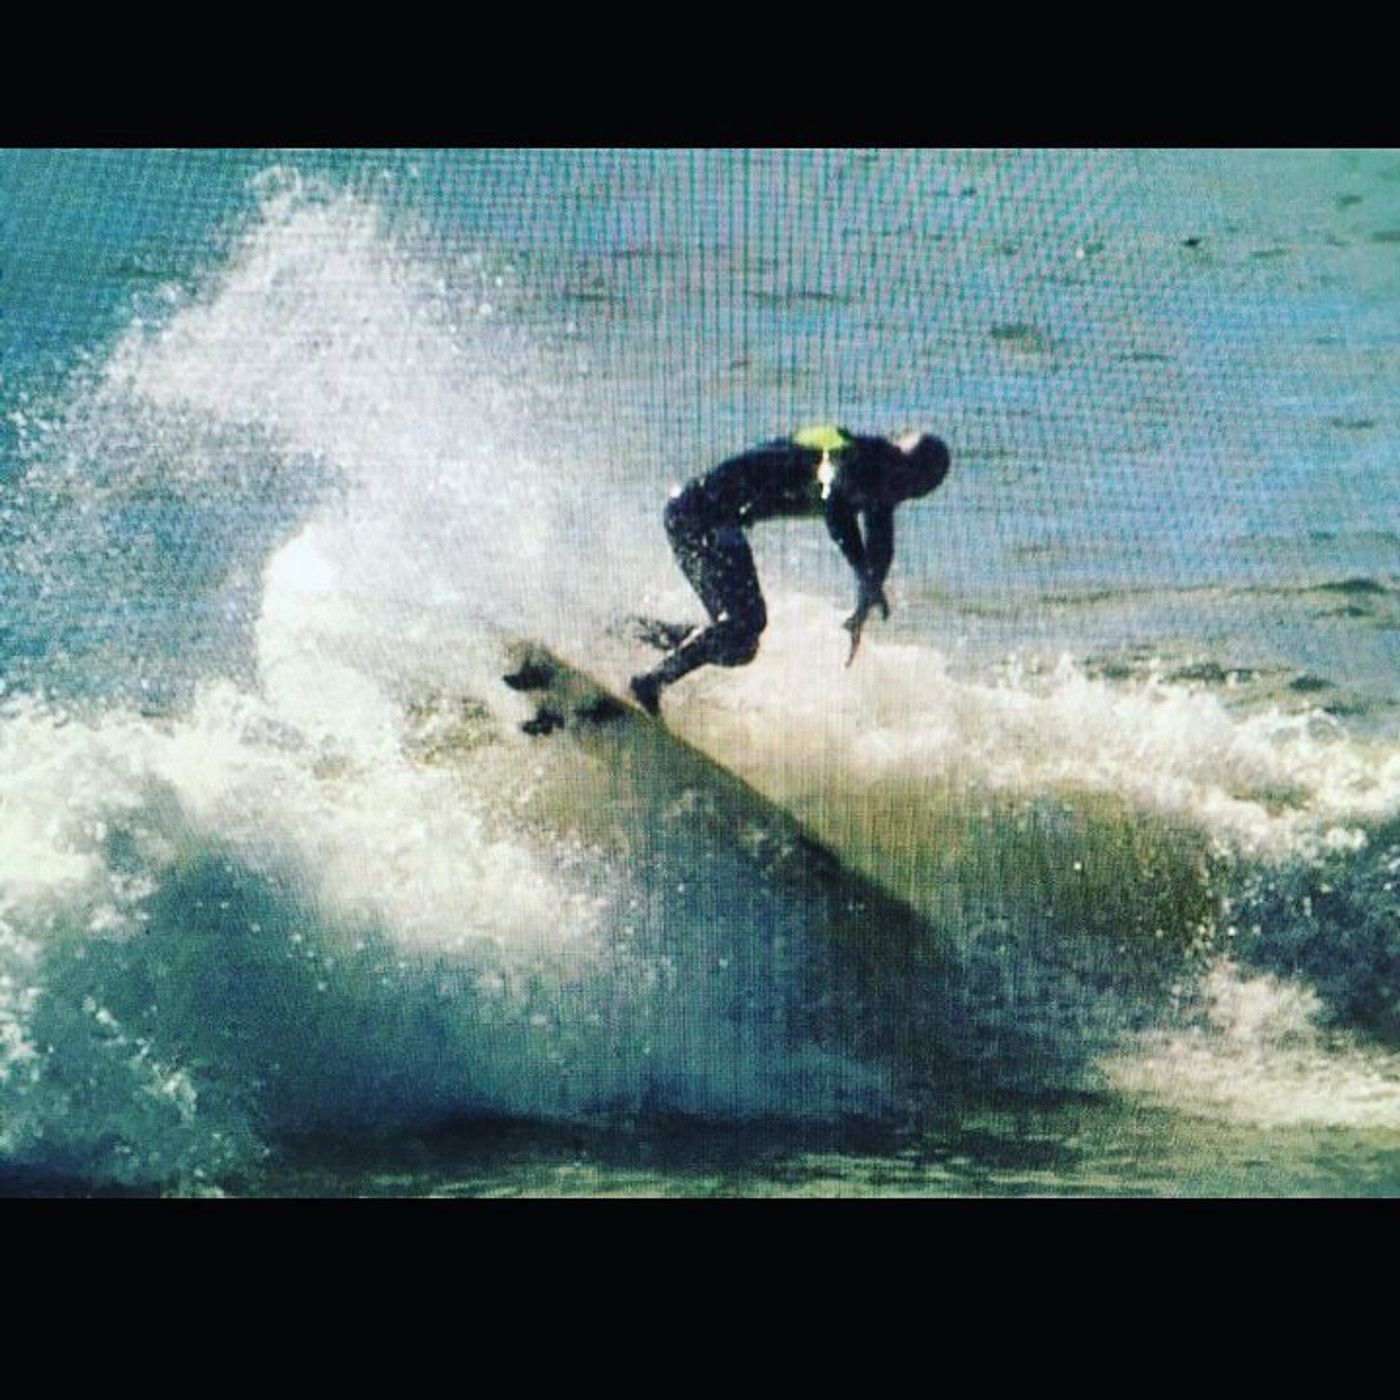 Zoltan Torkos hit the lip shove it riding the Lunasurf thruster fin.